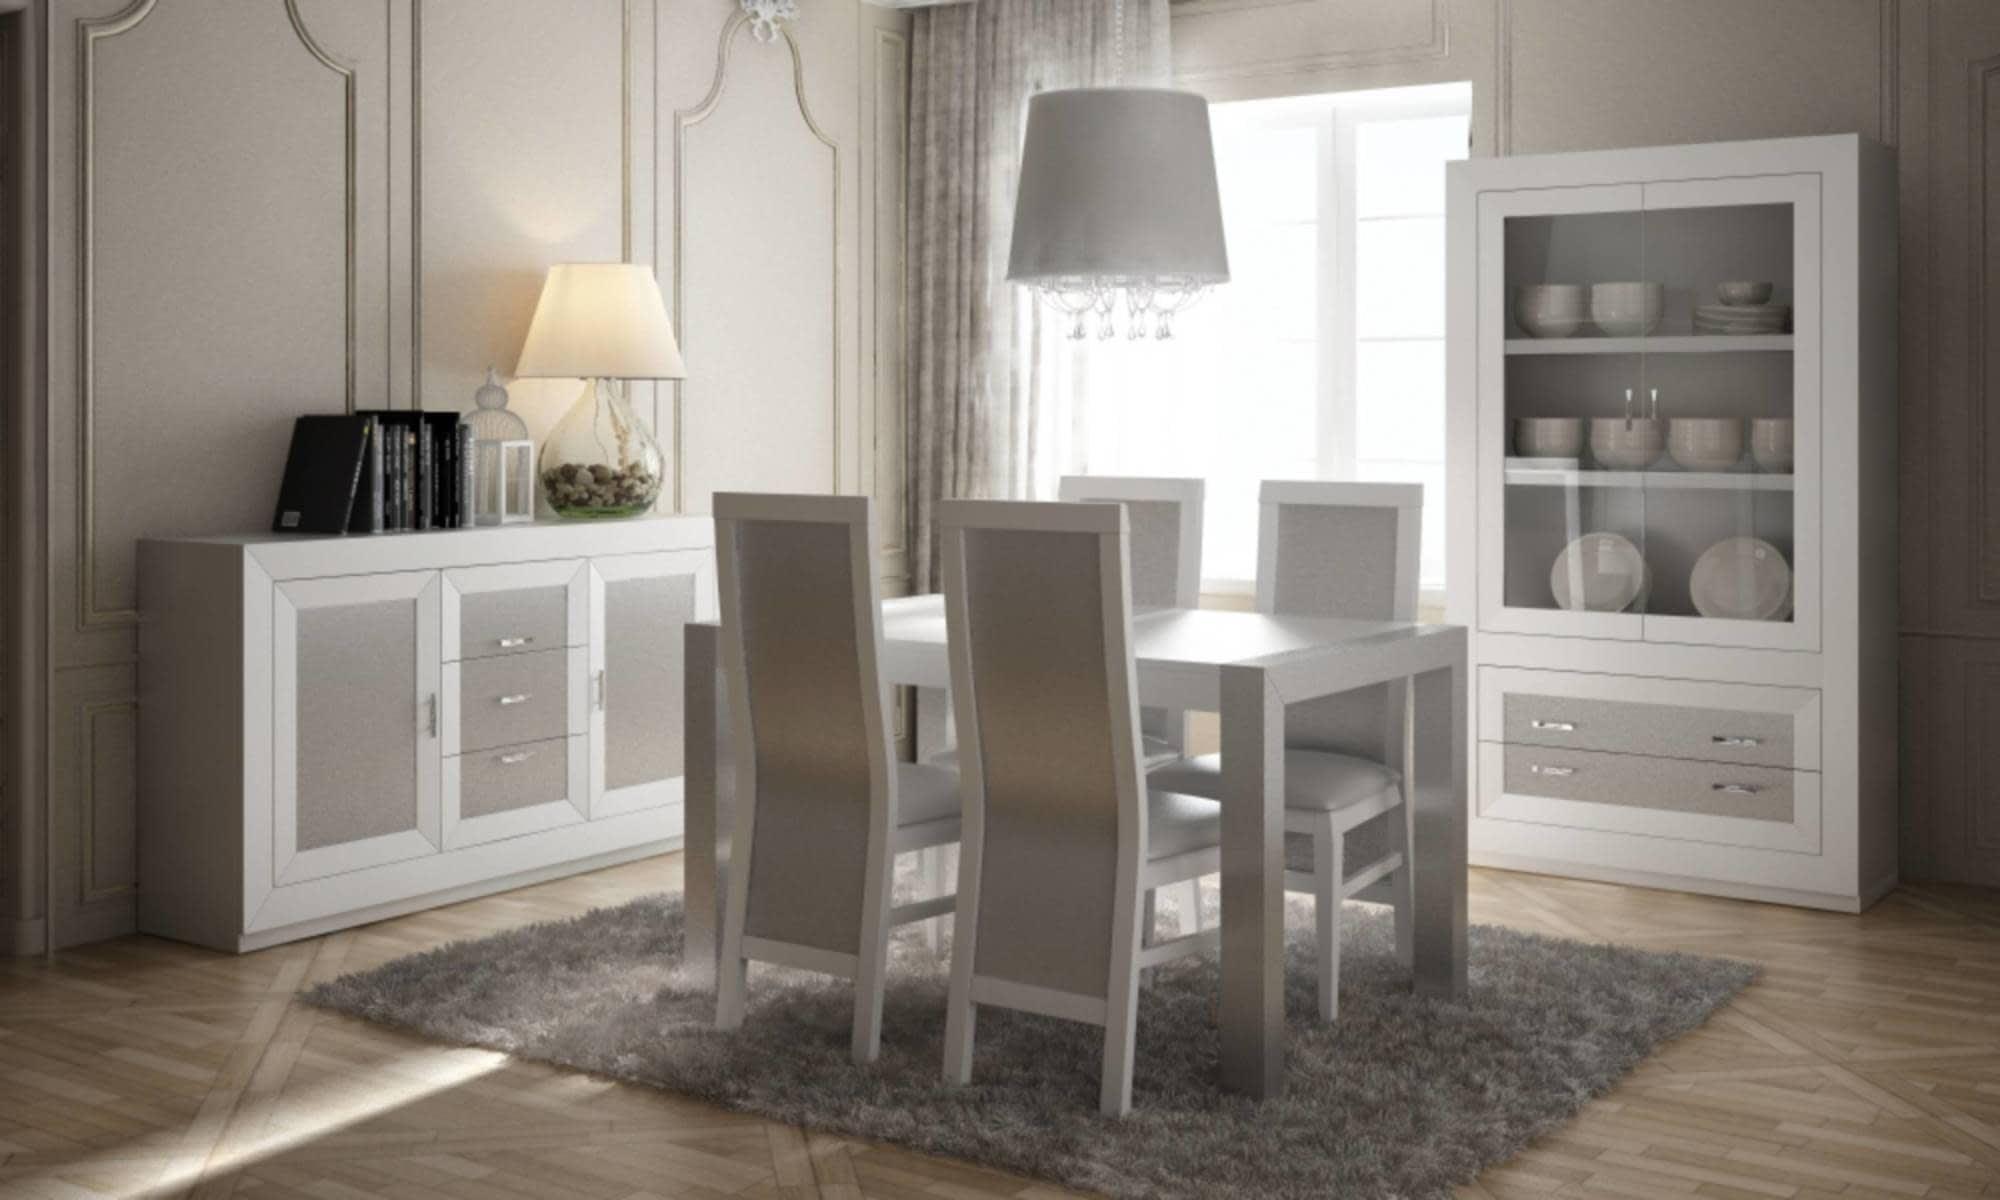 Muebles vulcano obtenga ideas dise o de muebles para su hogar aqu - Muebles cabrera huelva catalogo ...